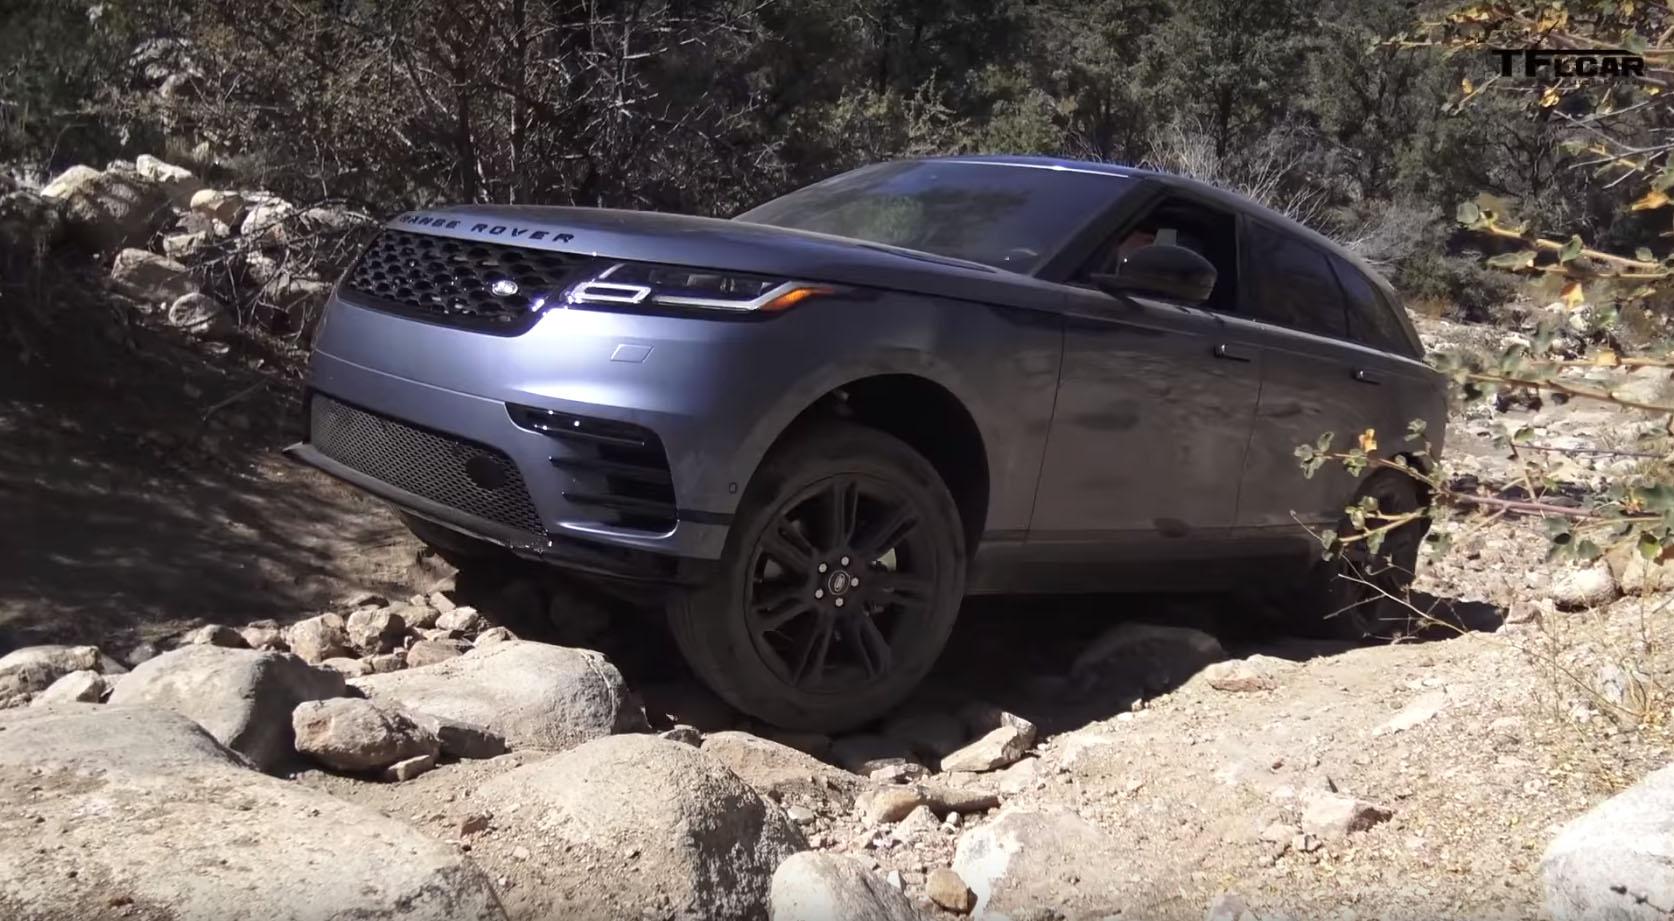 Posh 2018 Range Rover Velar Goes Off-Roading to Prove It's ...